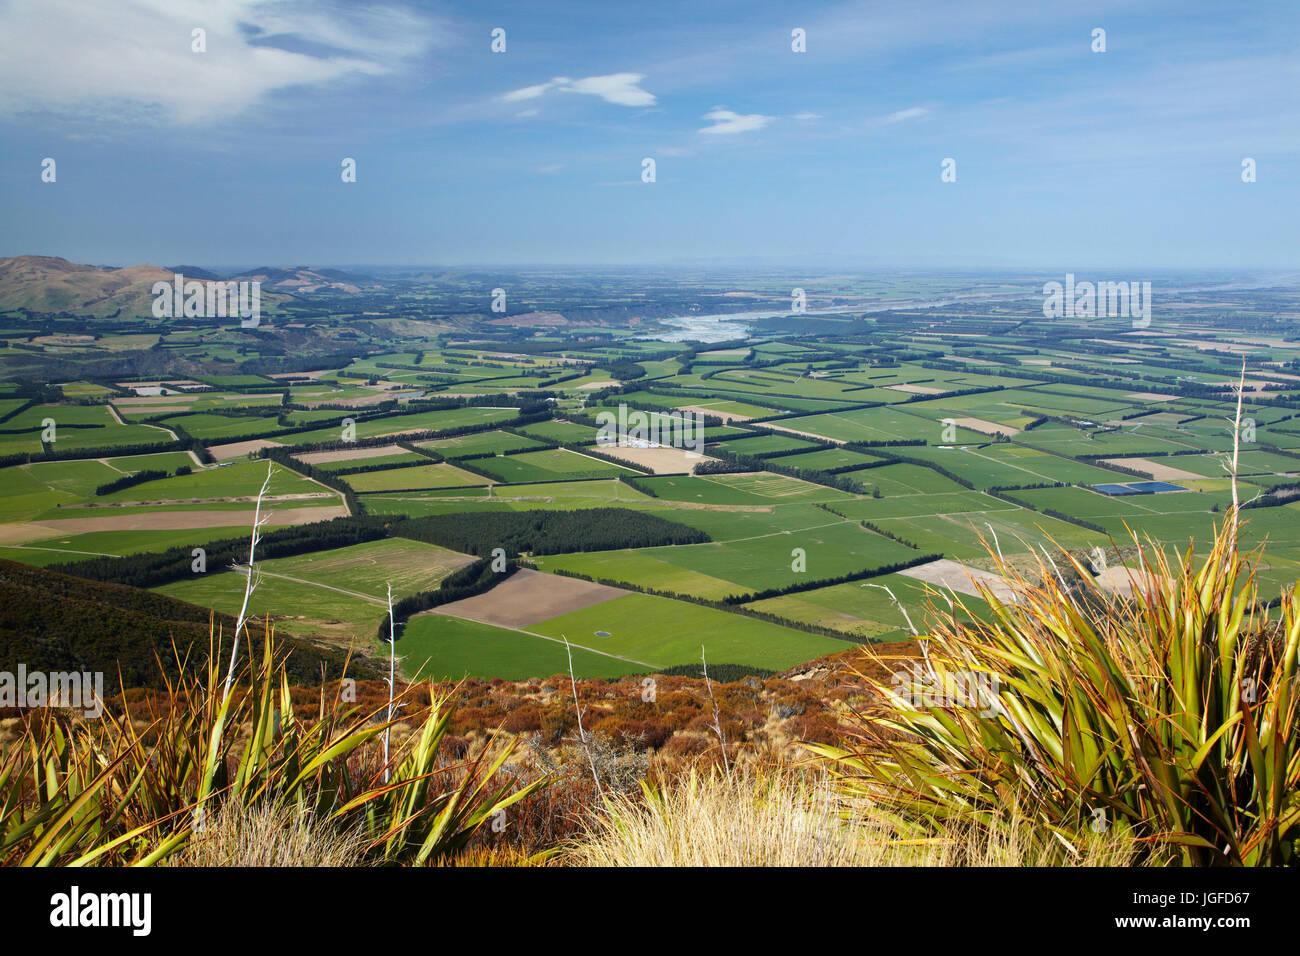 Canterbury Plains and Rakaia River seen from Mount Hutt, Mid Canterbury, South Island, New Zealand - Stock Image